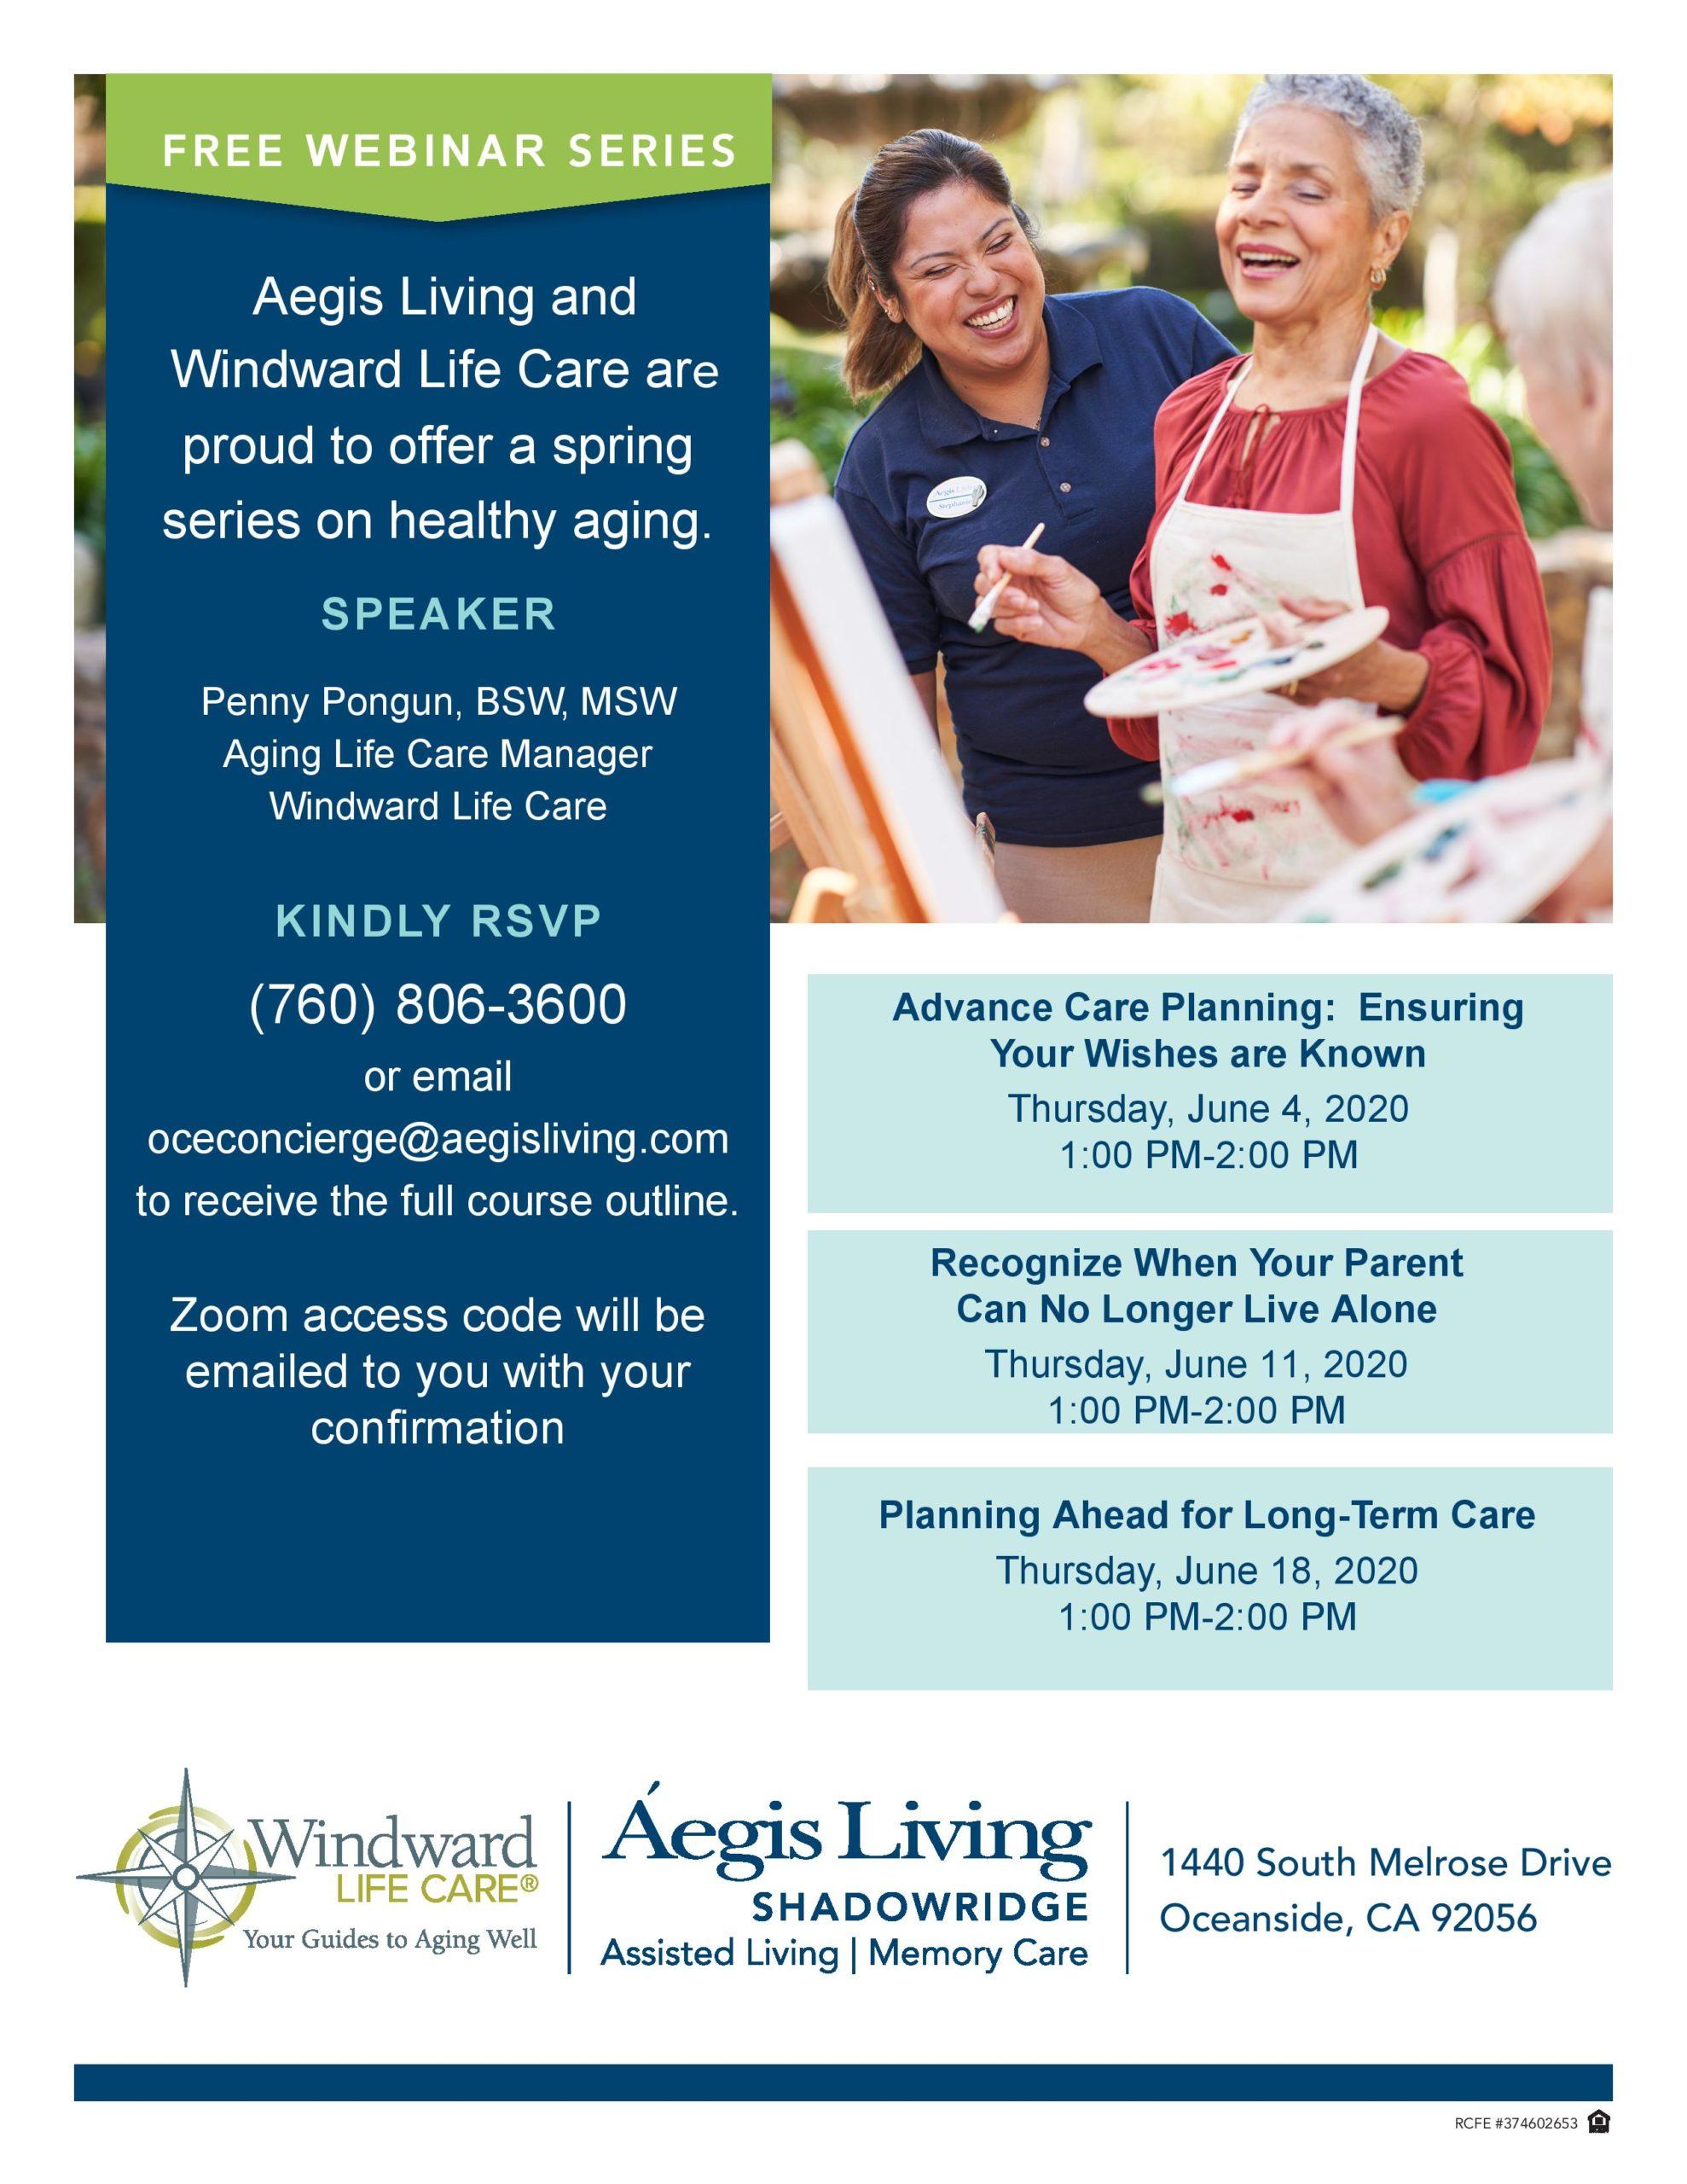 Aegis Assisted Living Webinar Series on Healthy Aging